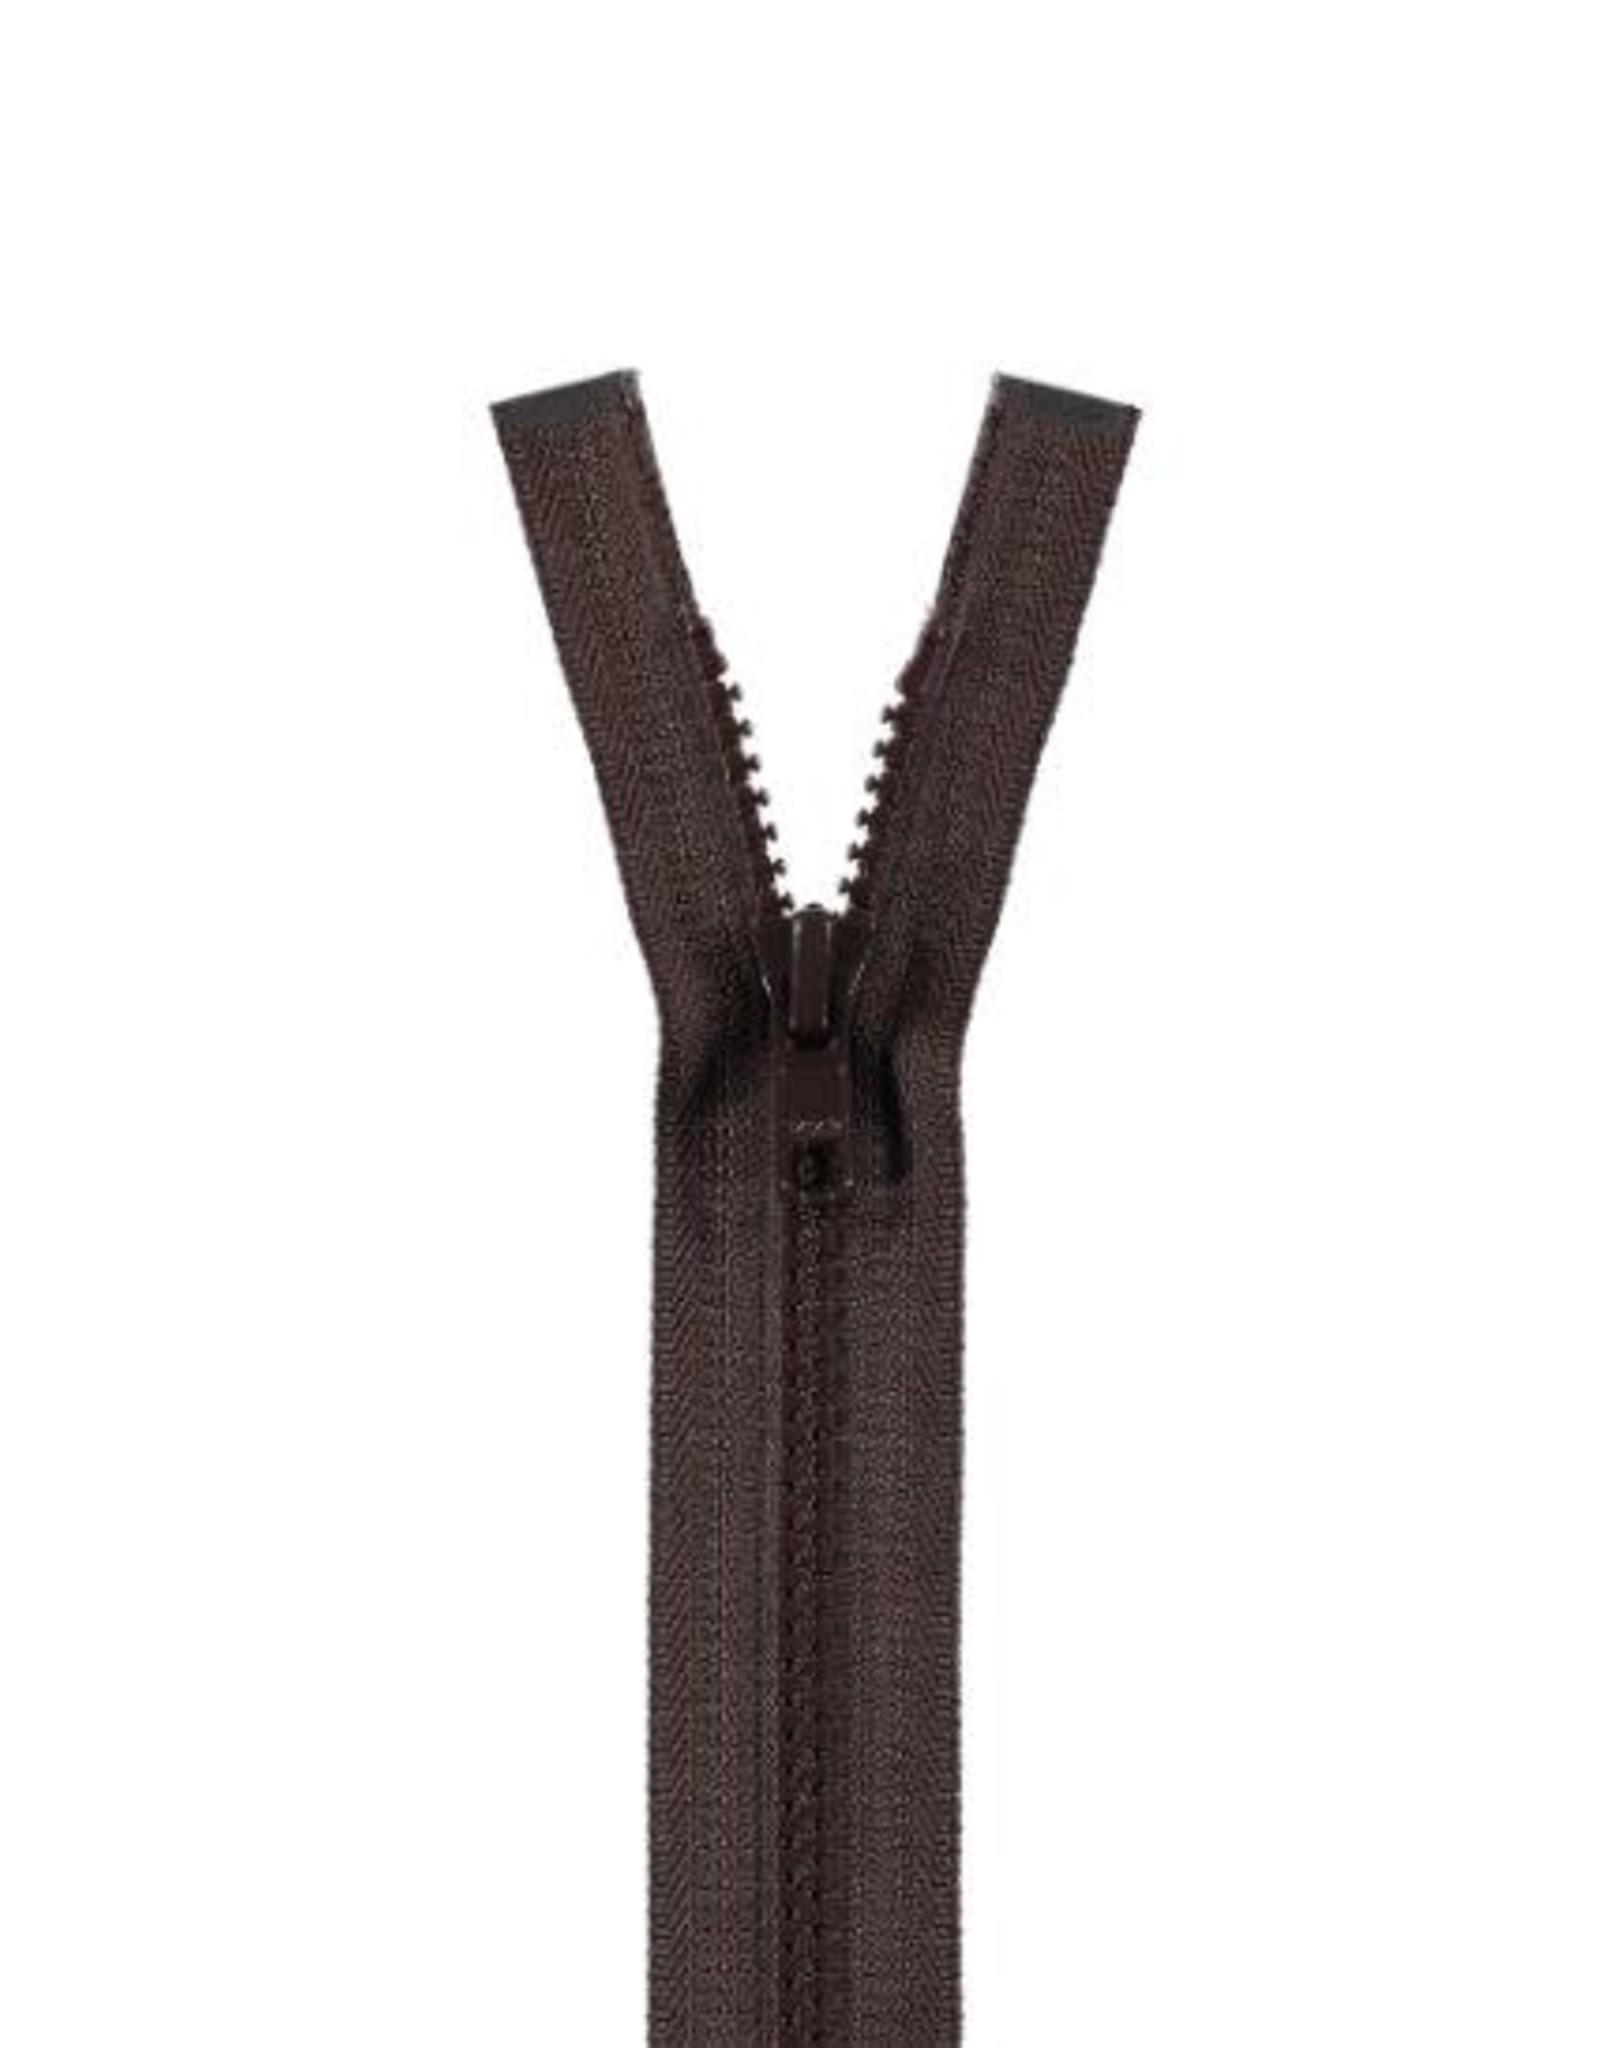 YKK BLOKRITS 5 DEELBAAR bruin 570-40cm